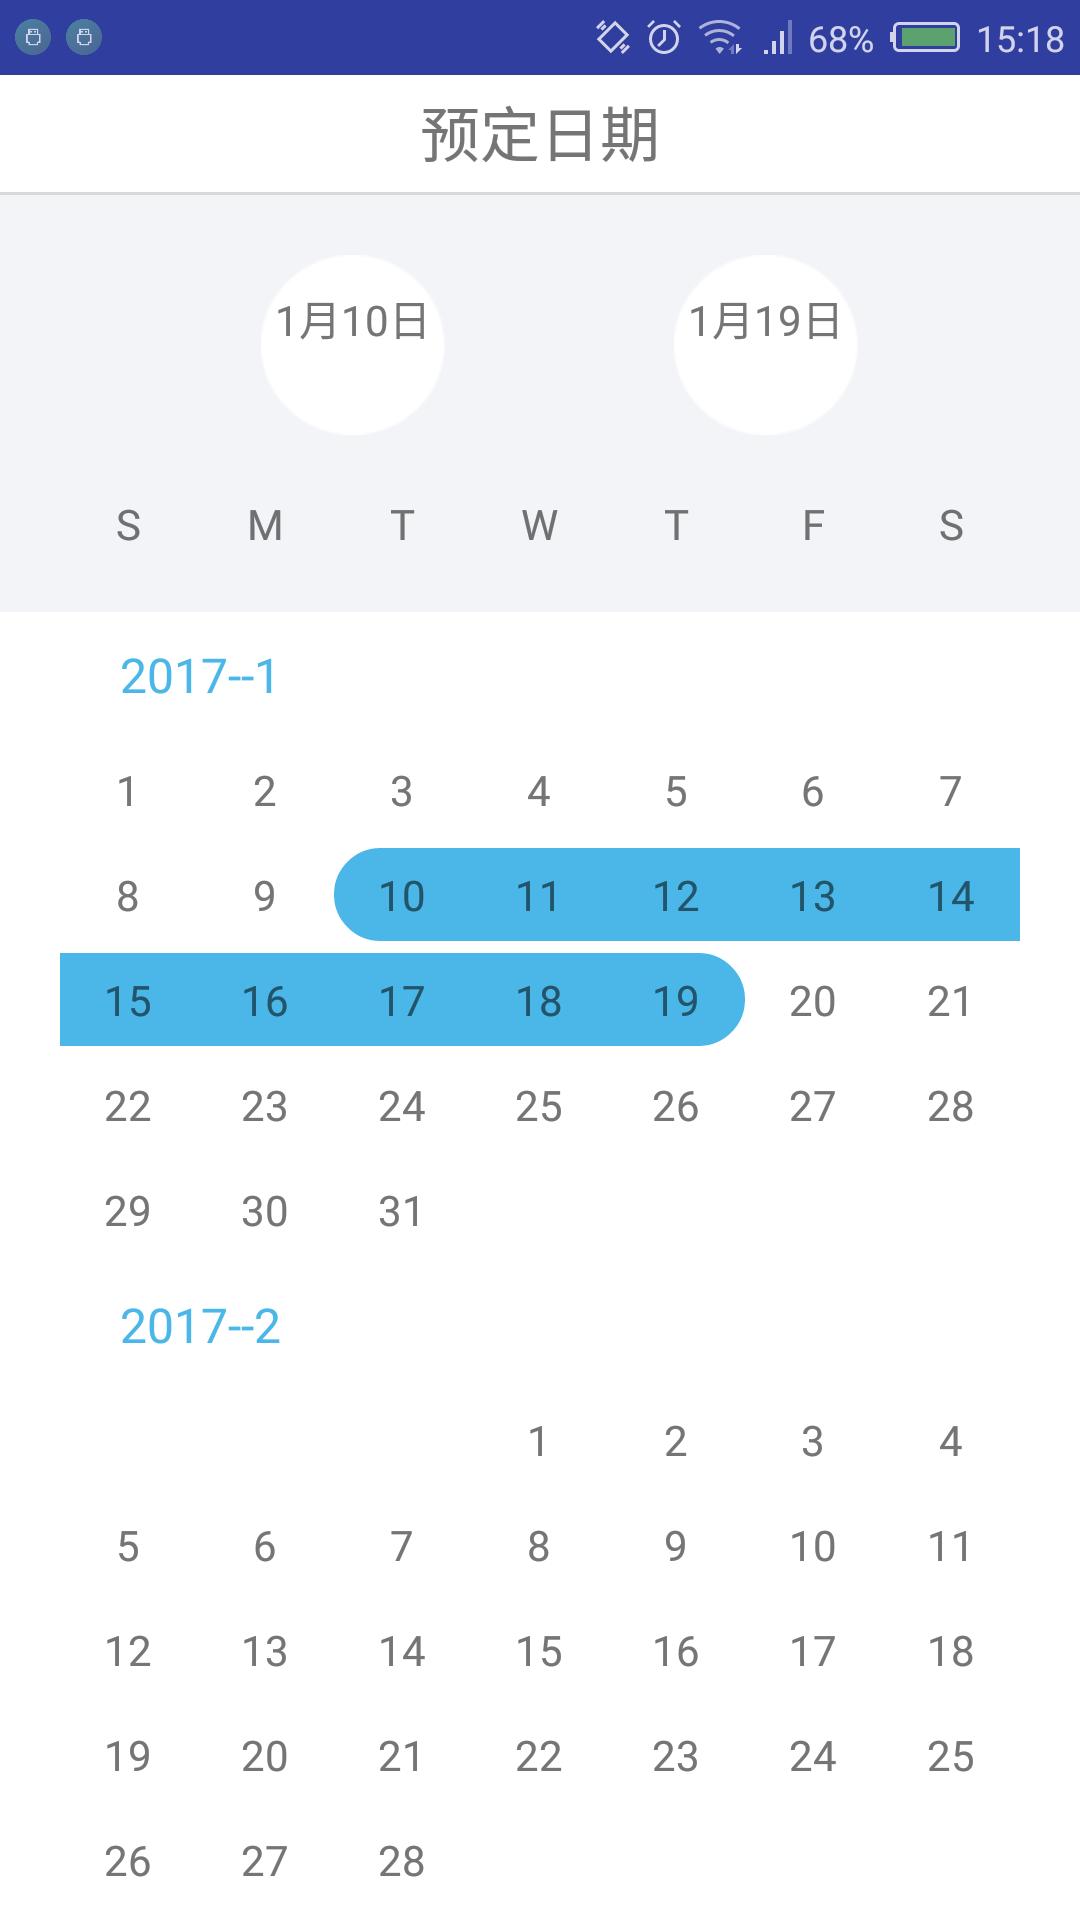 dating programvare for Android eksempel på morsomme online dating profil